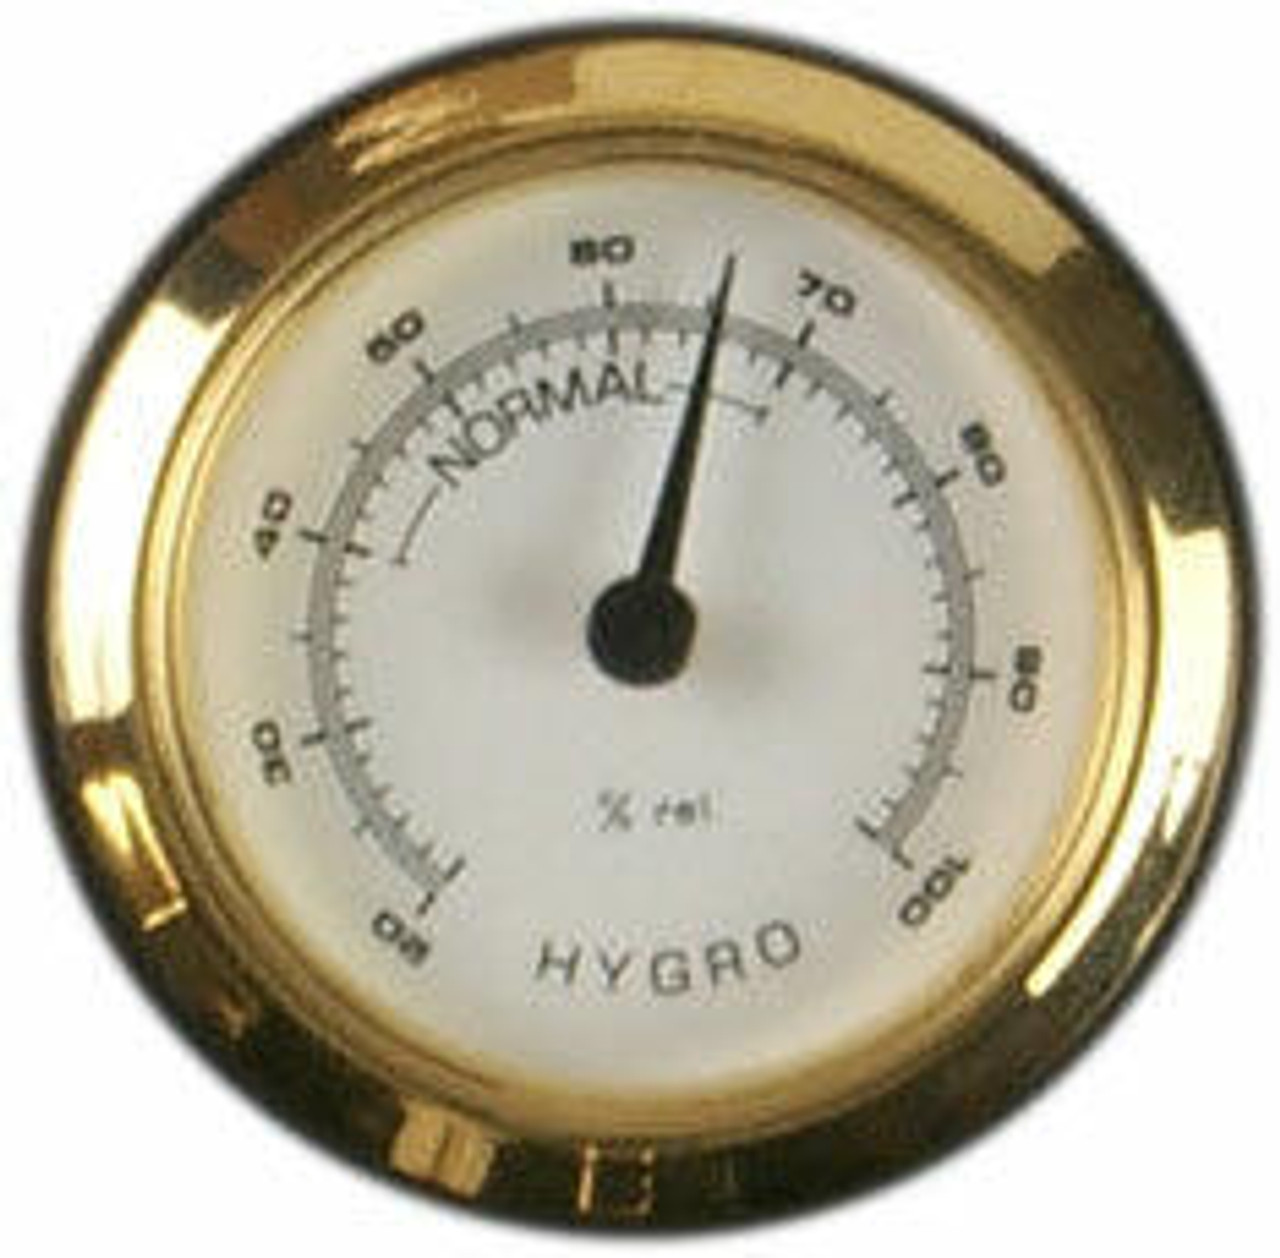 Wildwood Designs Mini Weather Instruments